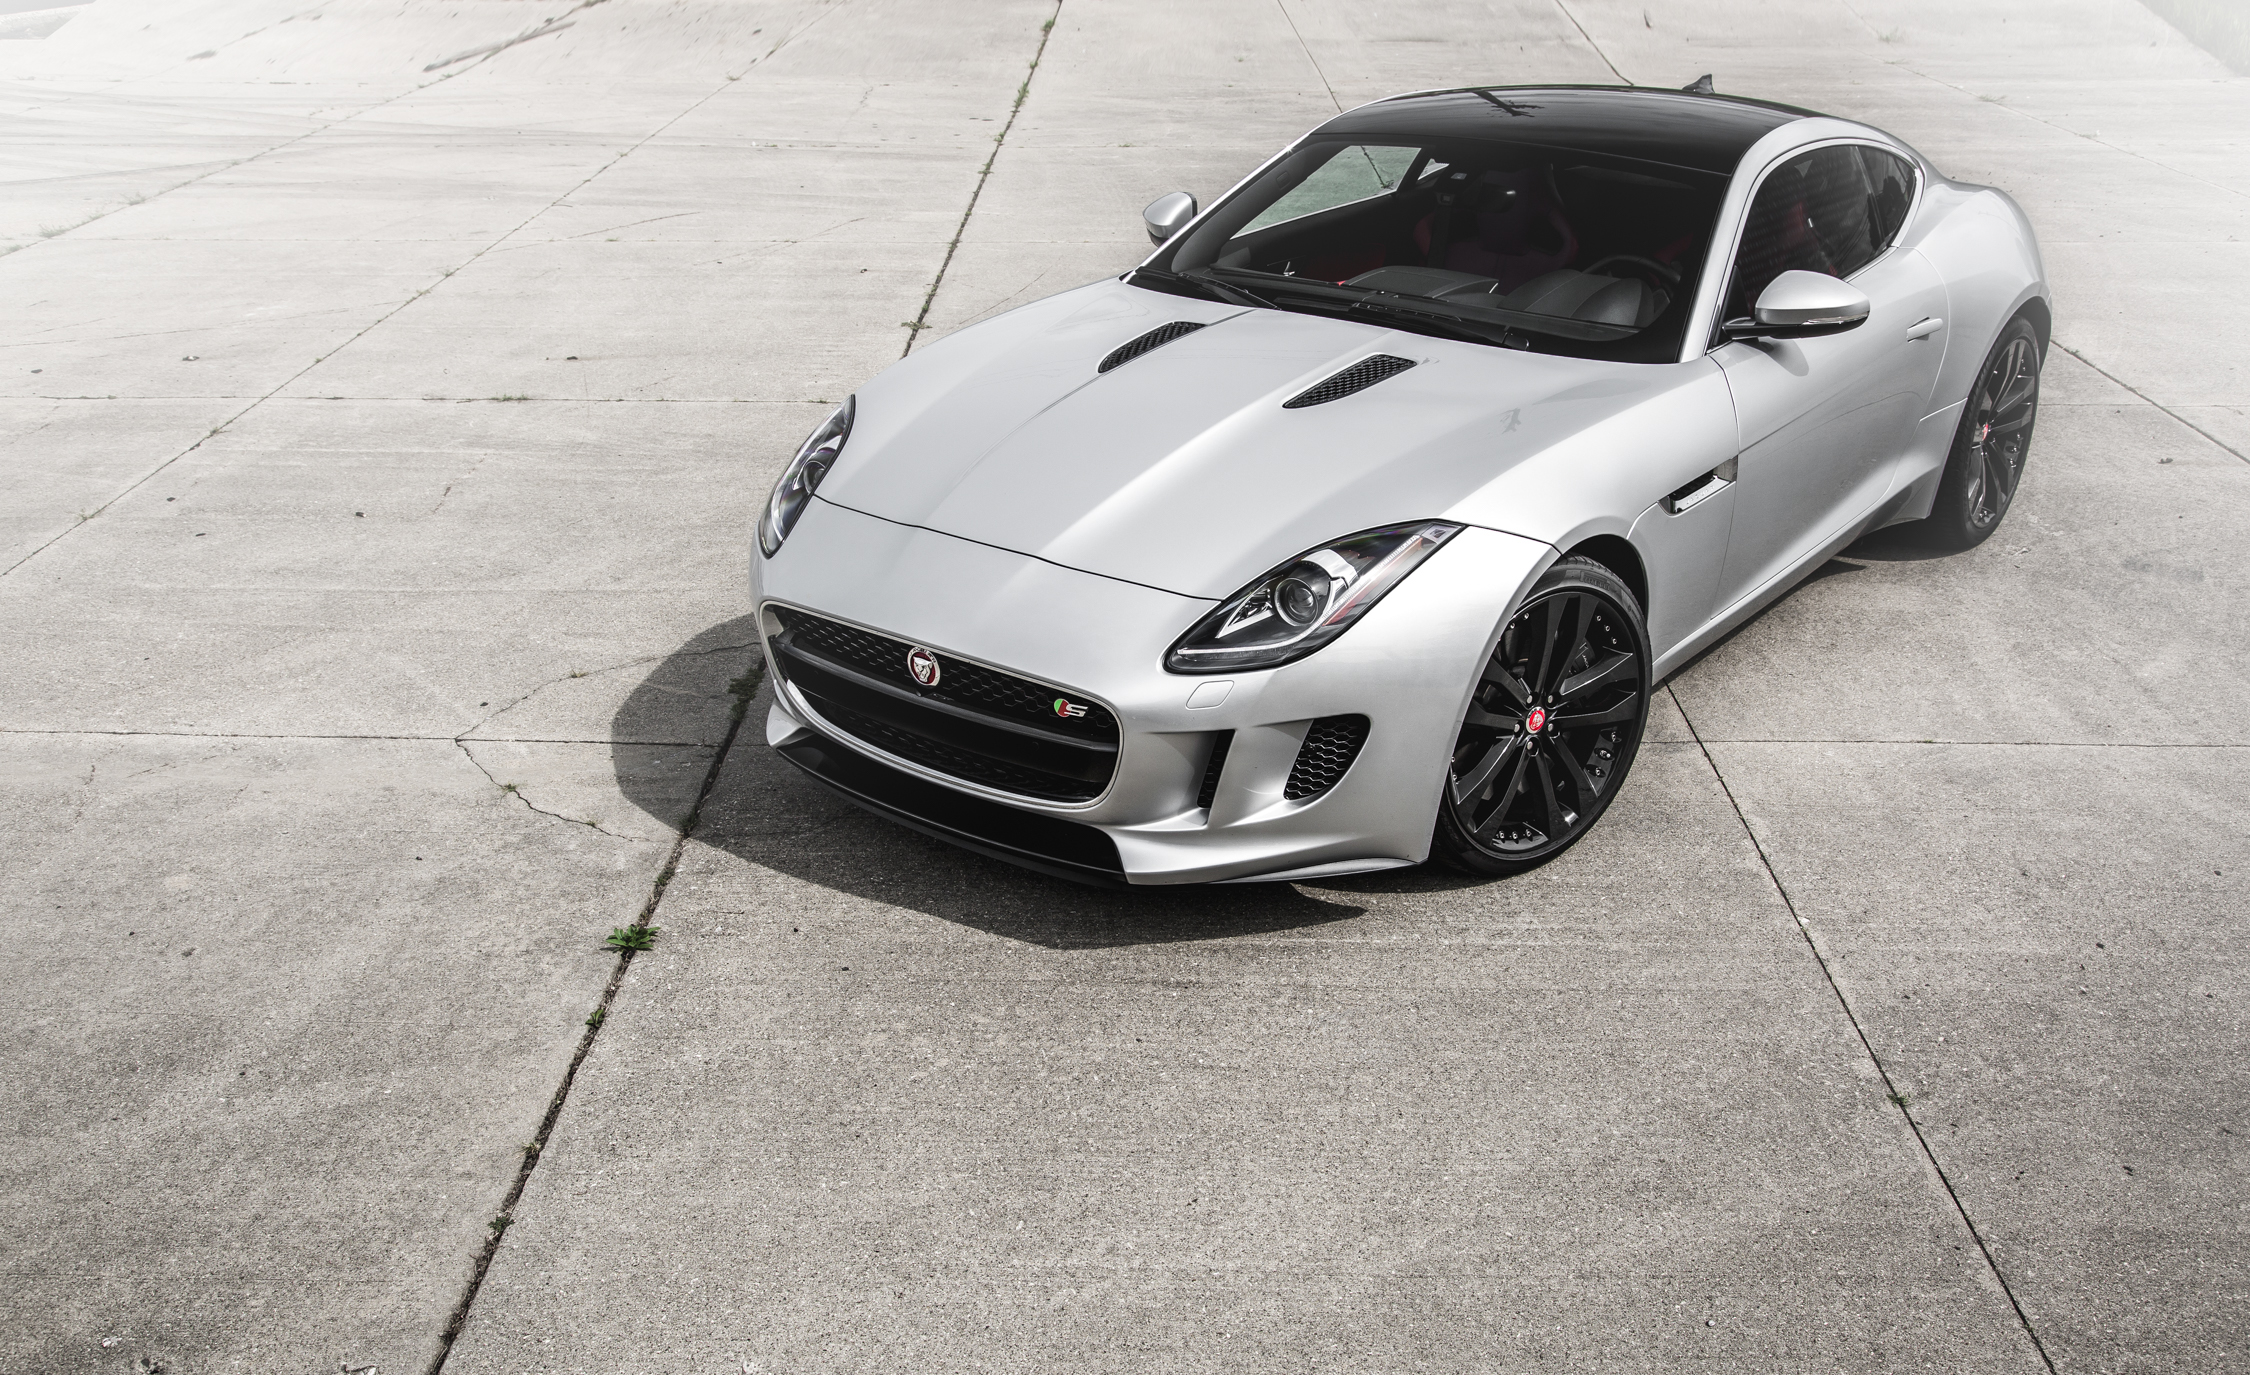 2016 Jaguar F-Type S Exterior